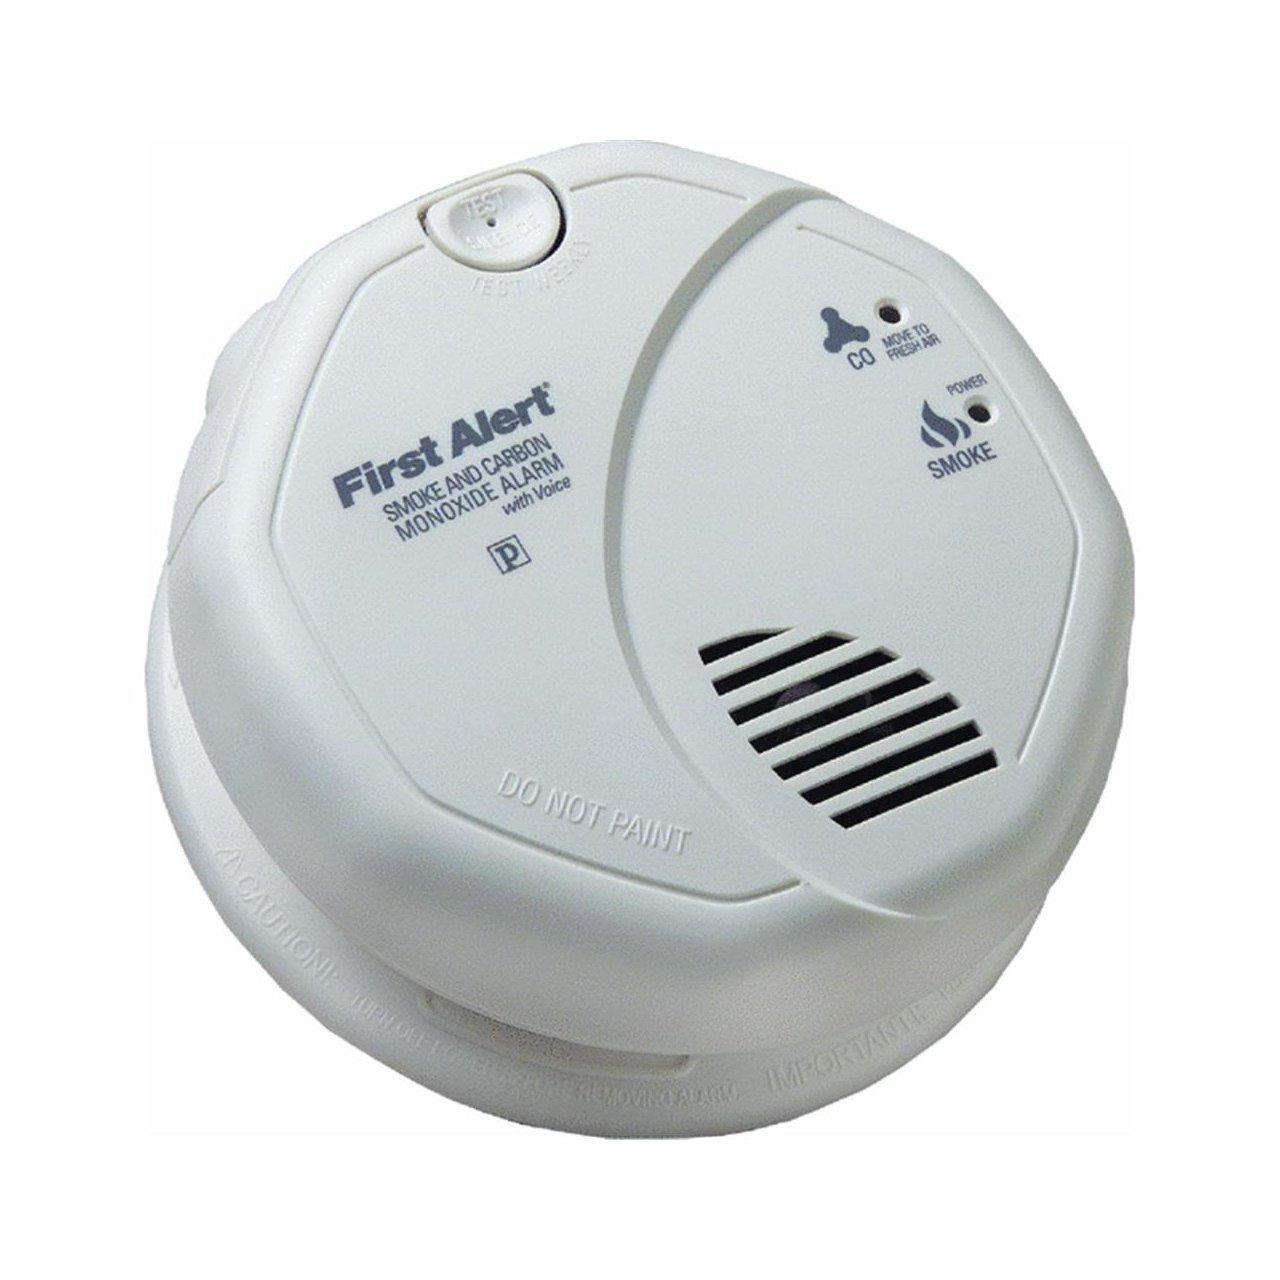 First Alert/Jarden SC7010BV Hardwired Talking Smoke And Carbon ...